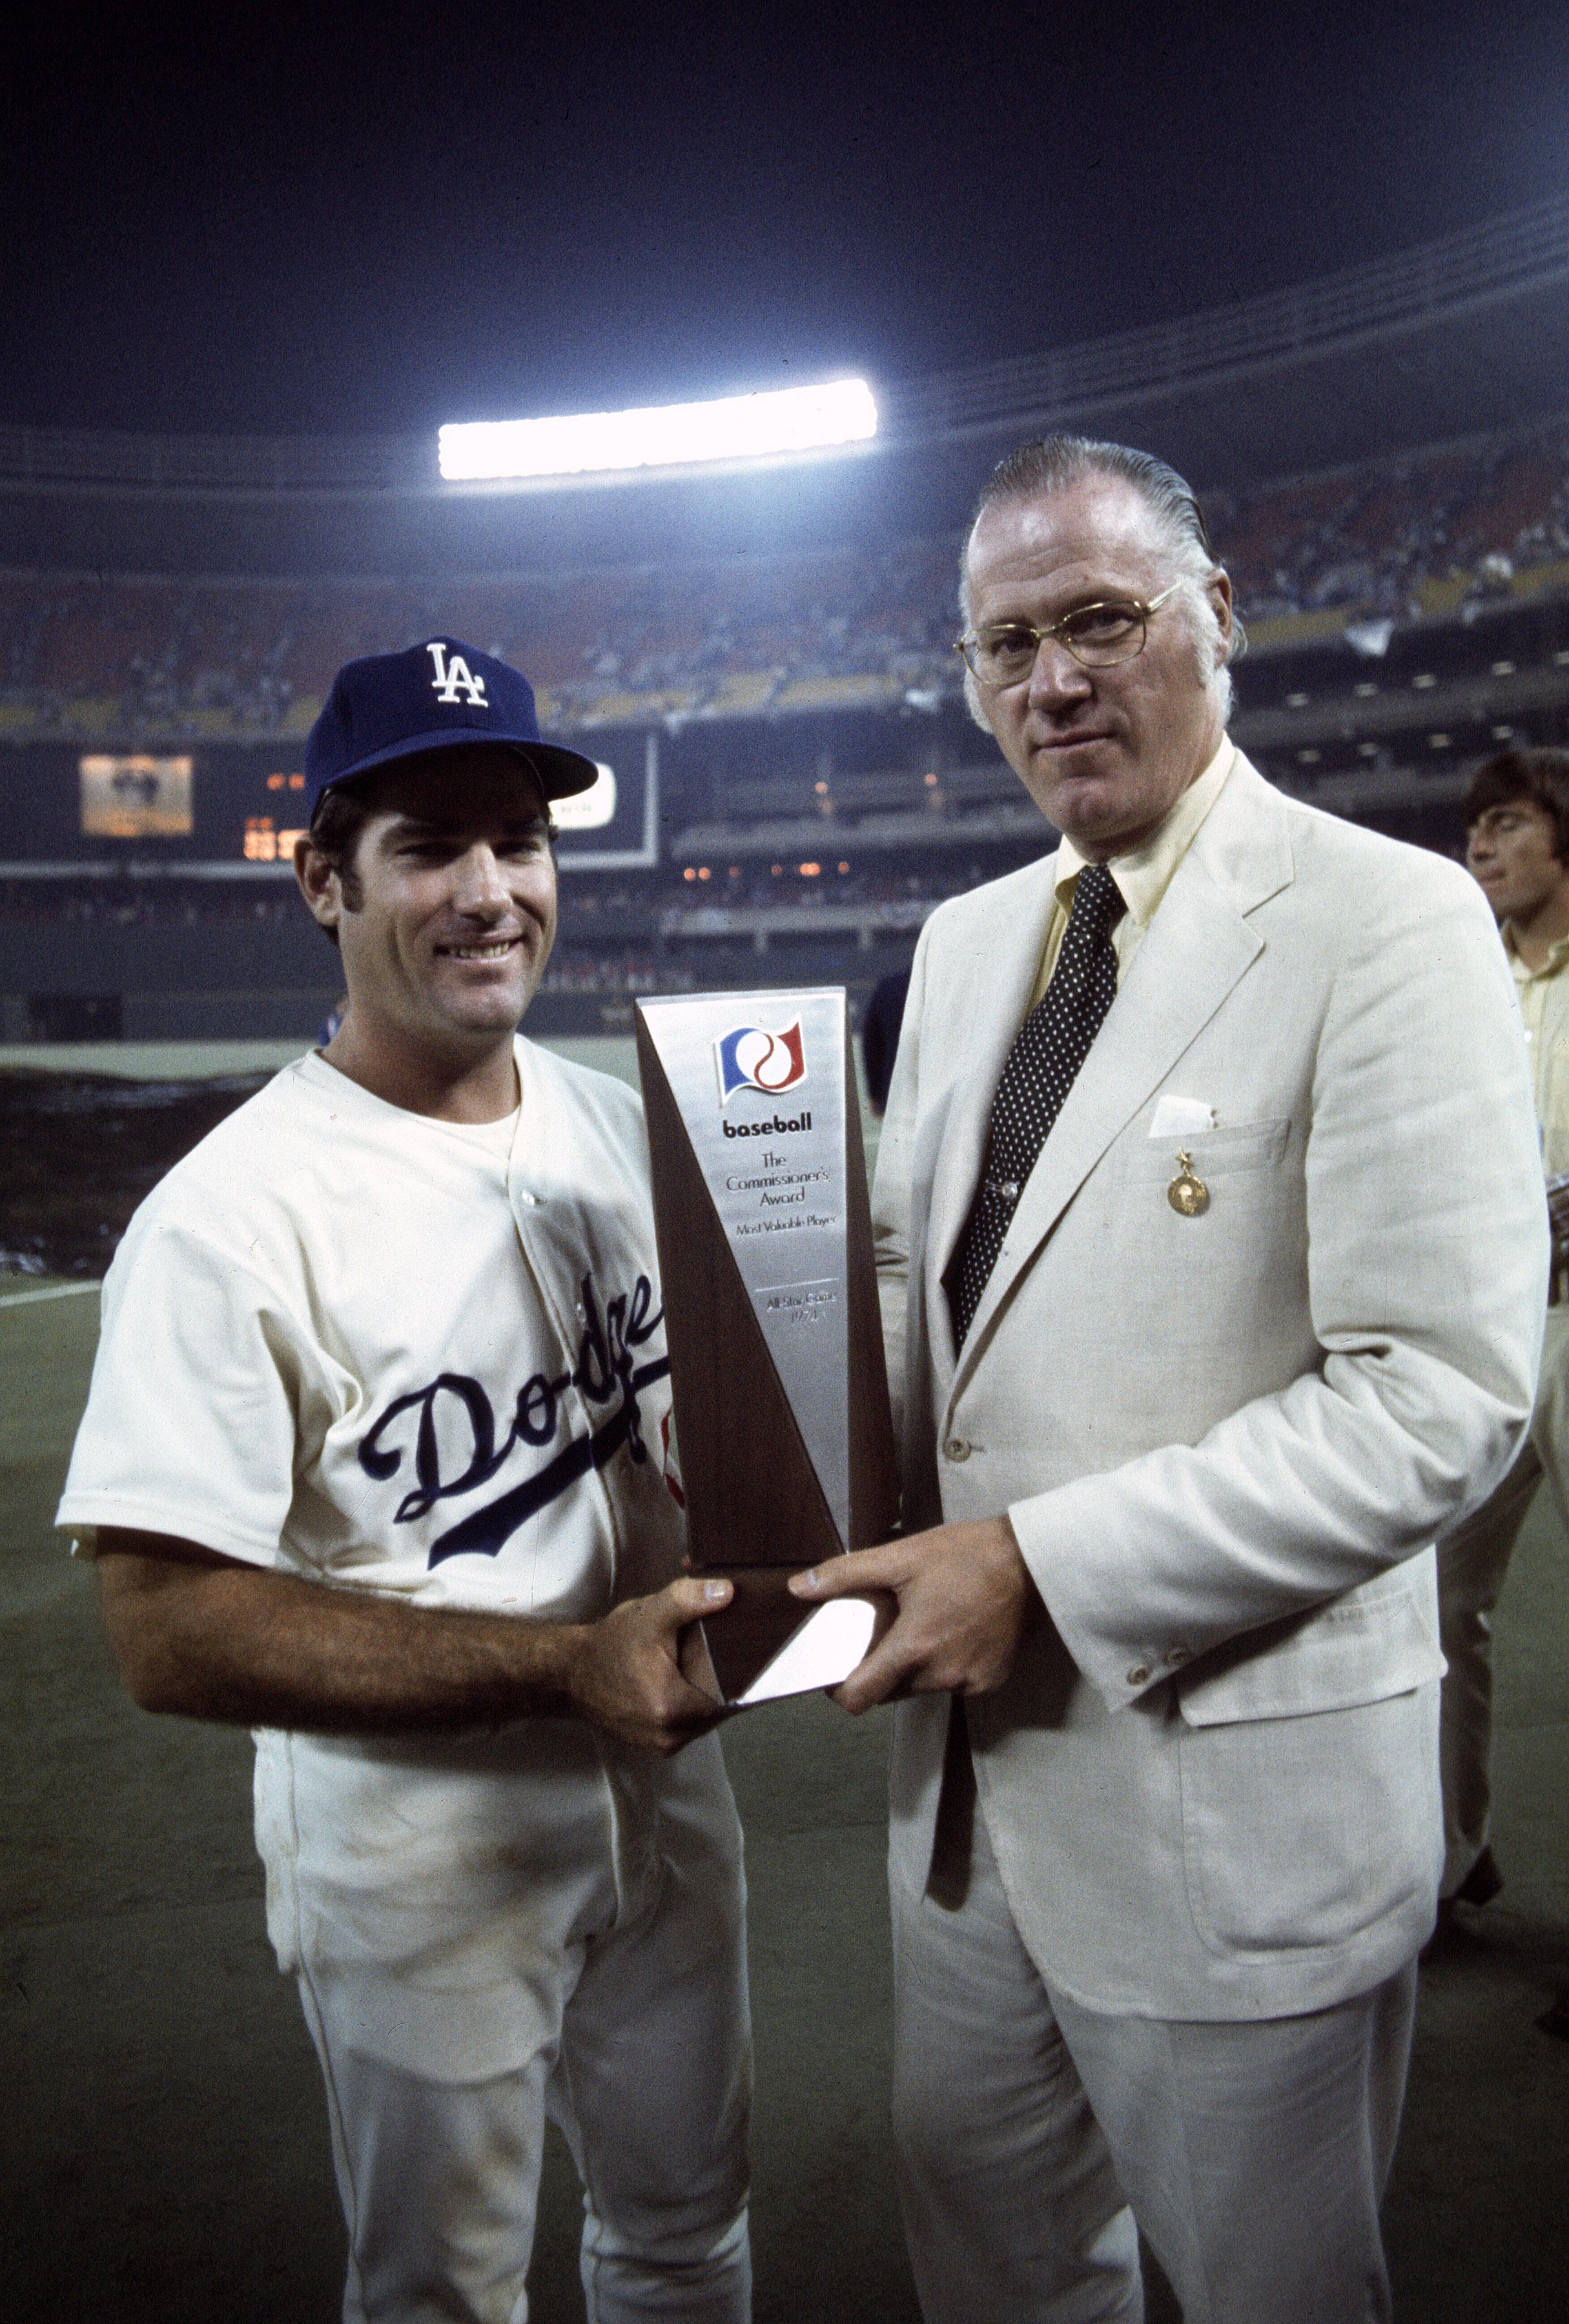 1974 Major League Baseball Allstar Game - American League v National League